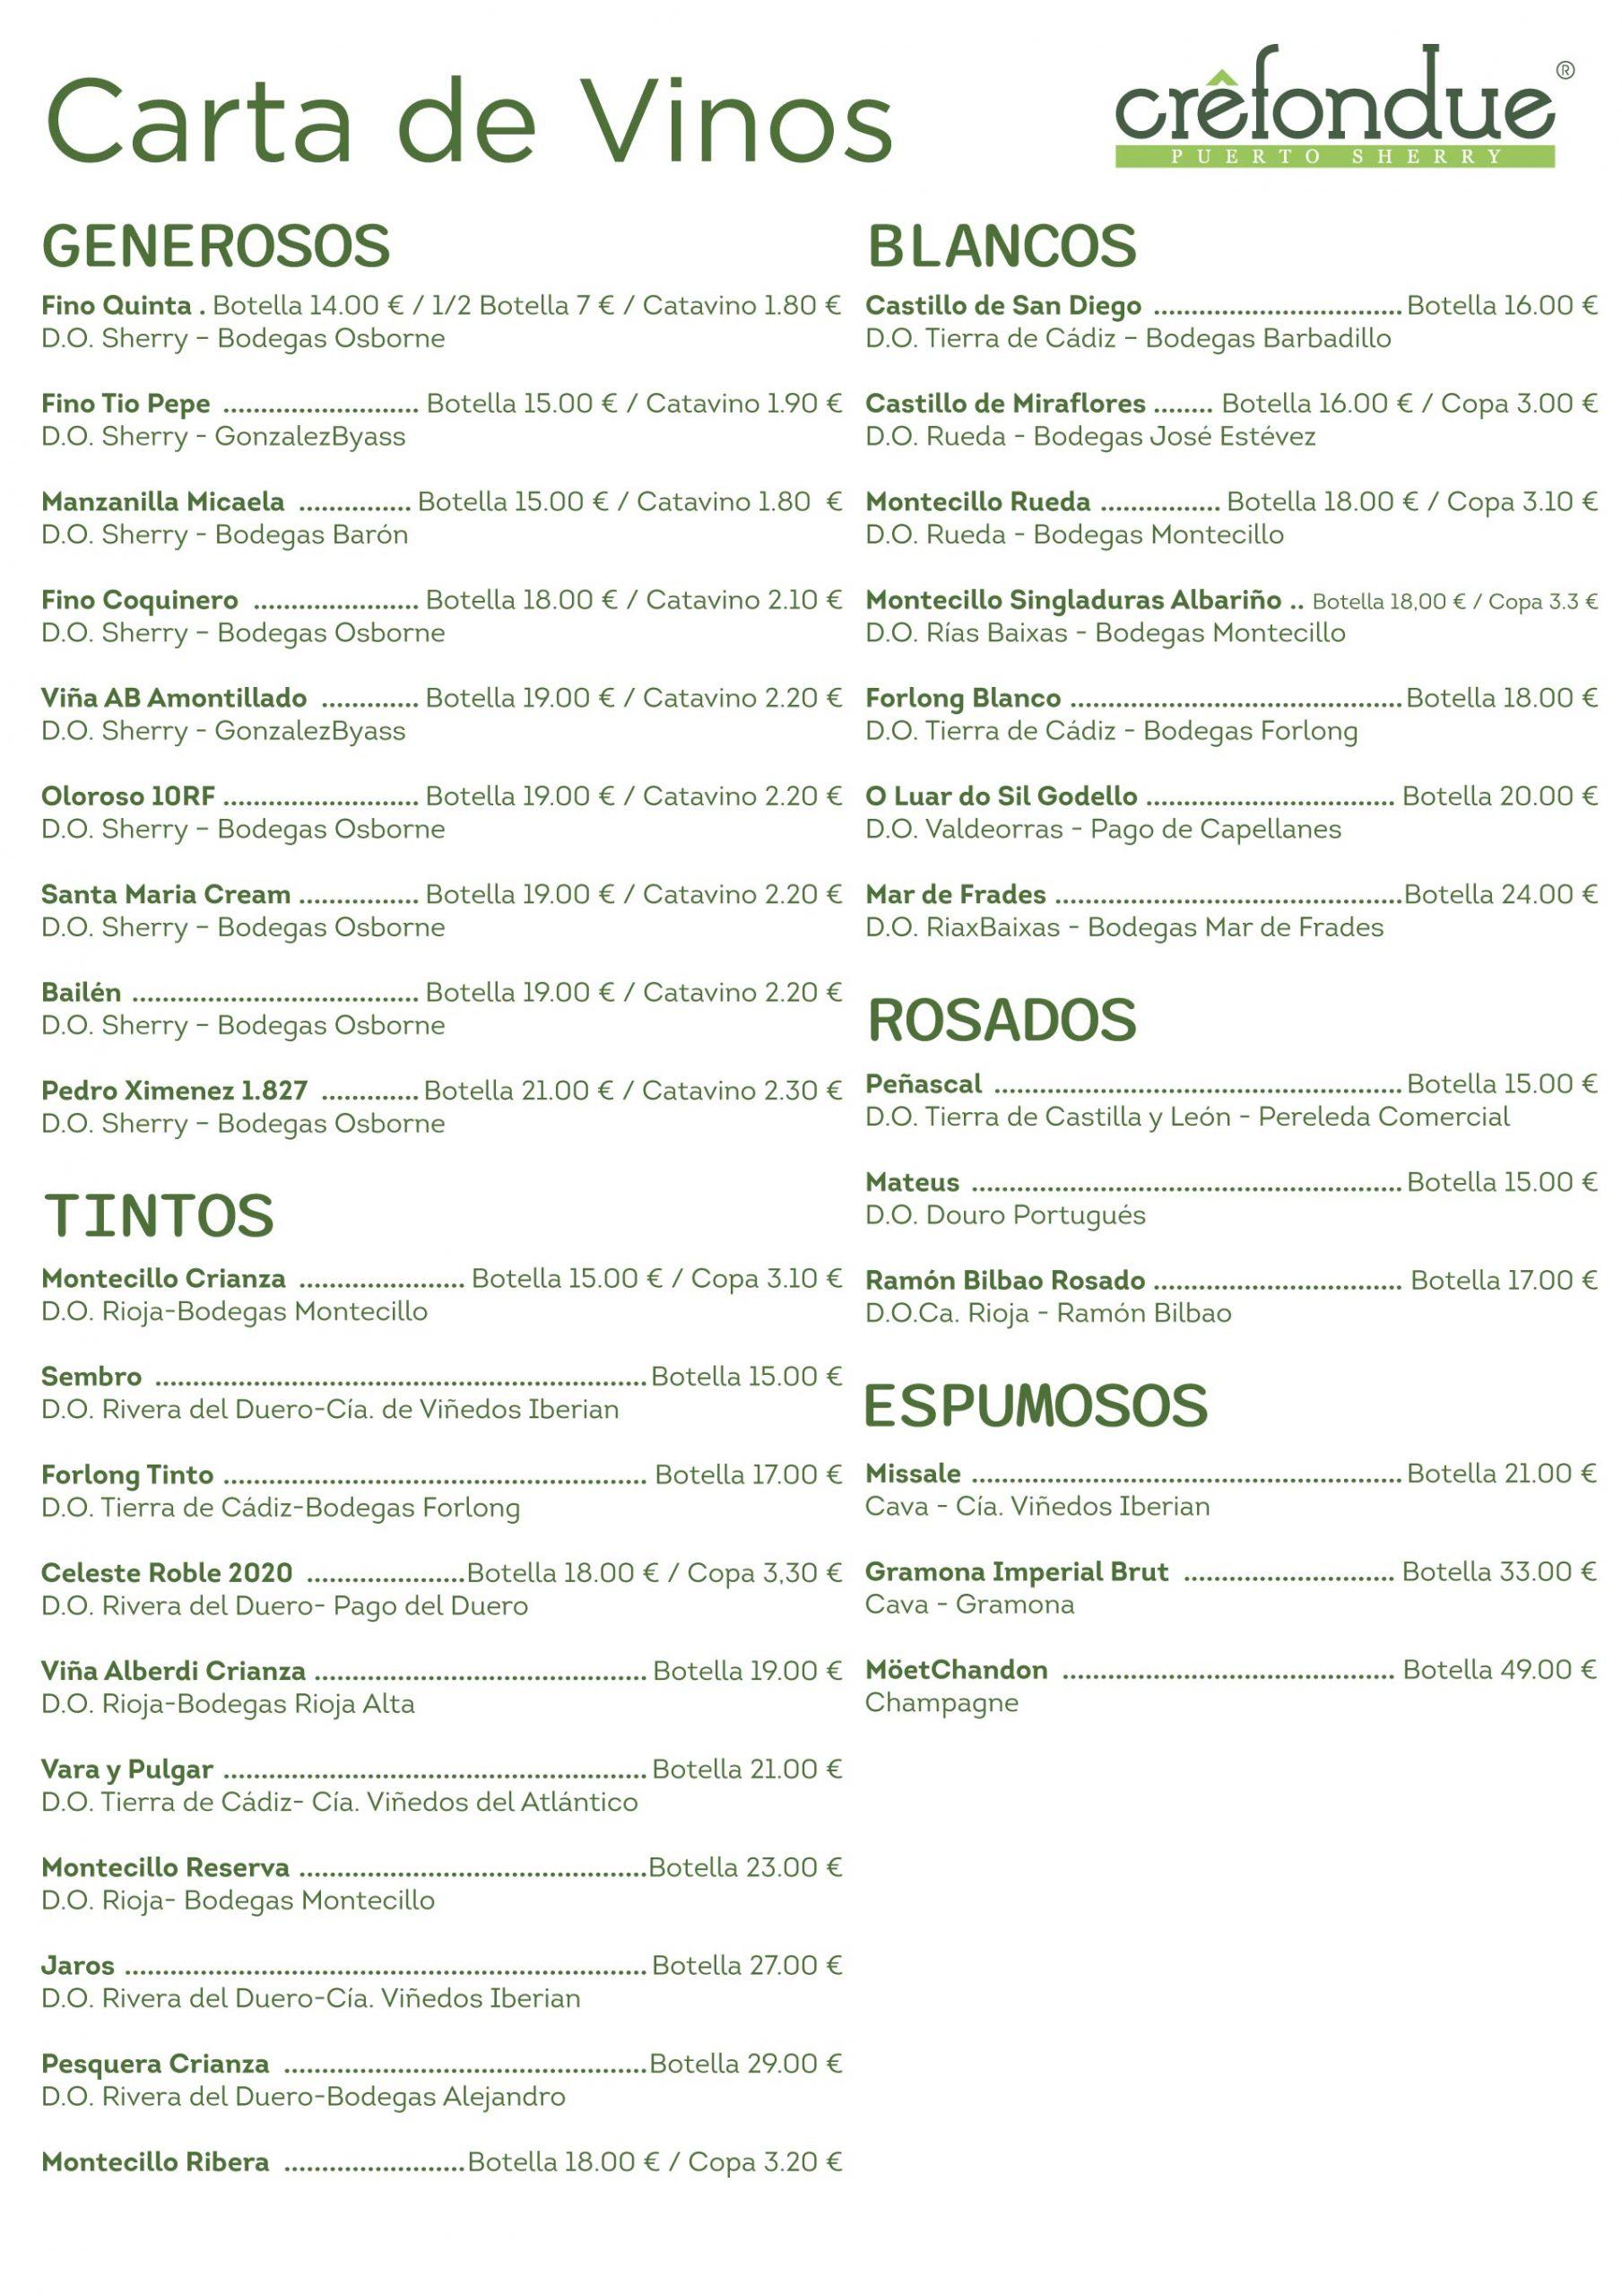 Crefondue Puerto Sherry   Carta de Vinos